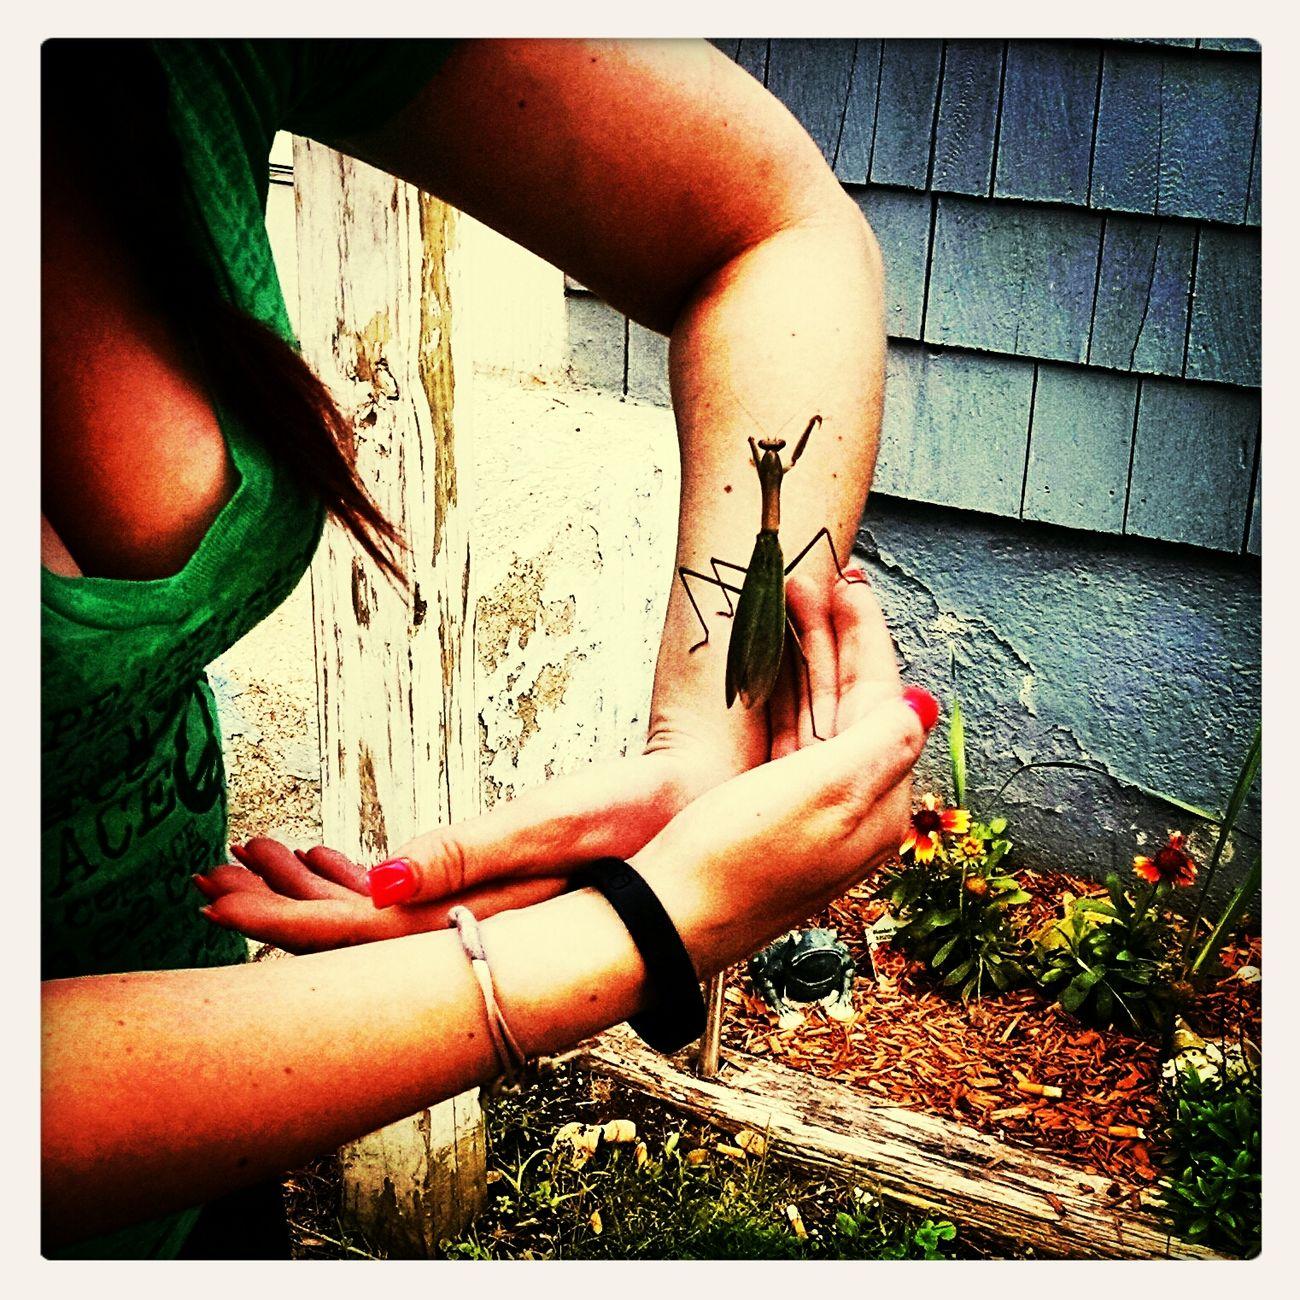 That's Me Praying Mantis Thats A Big One